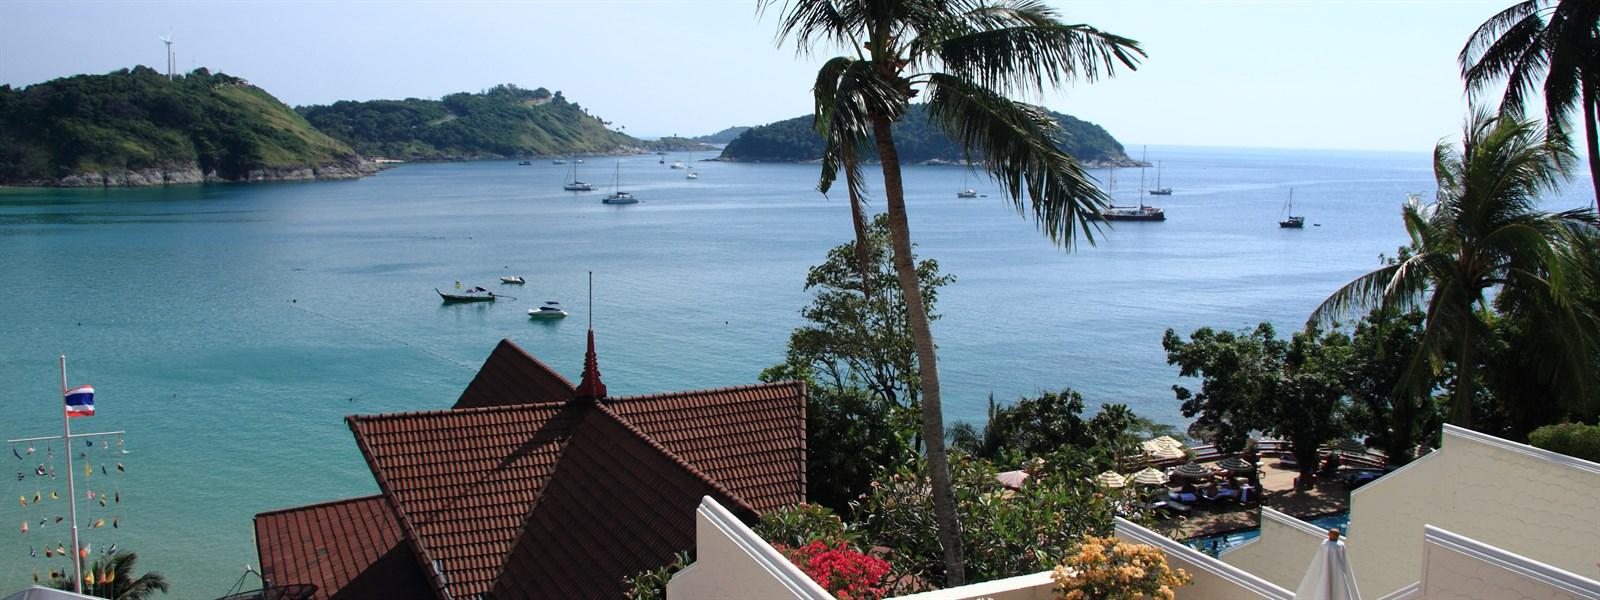 Eine Woche Nai Harn im Royal Phuket Yacht Club